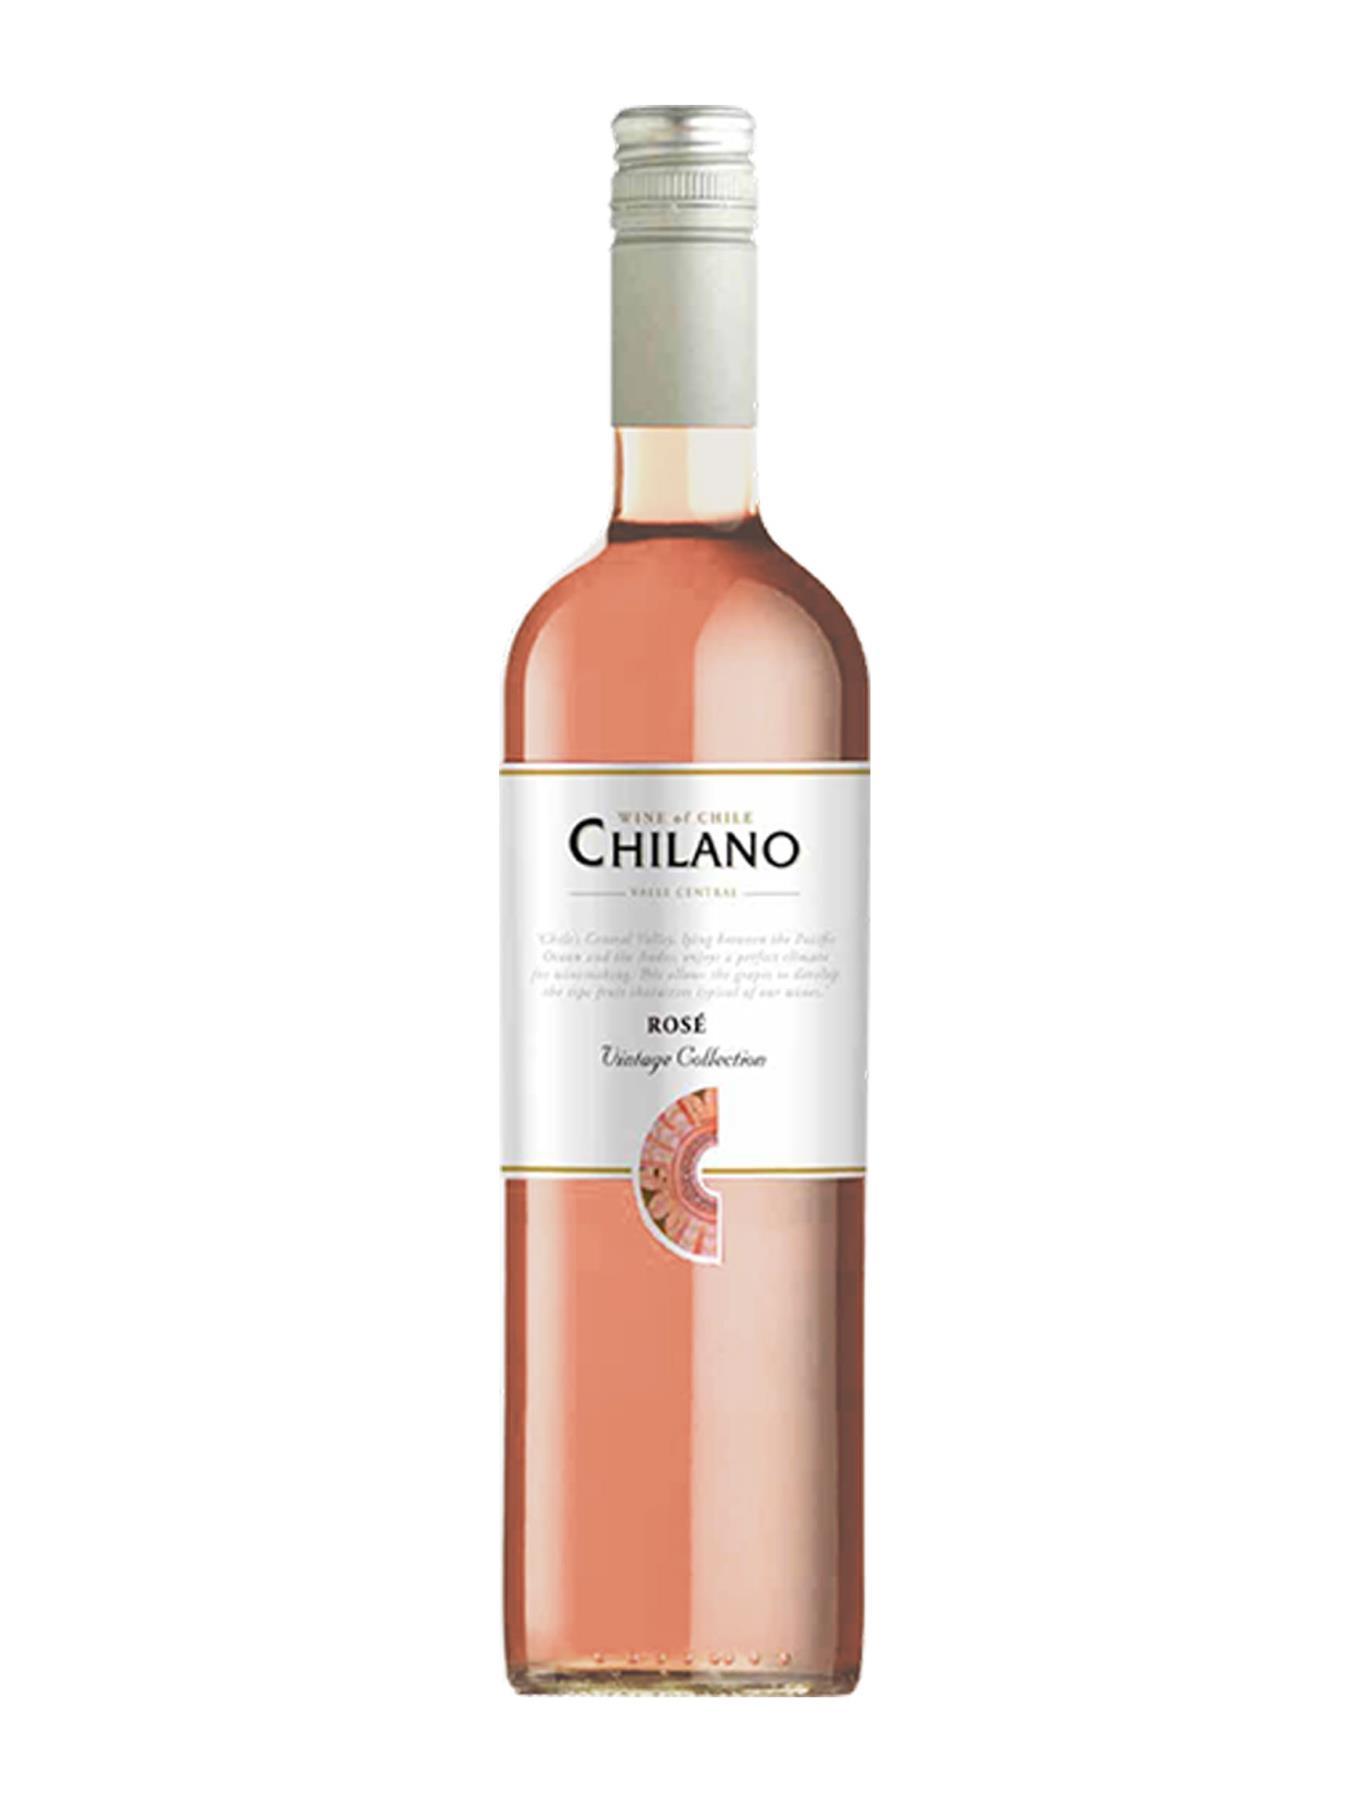 VINHO CHILANO ROSE 750ML